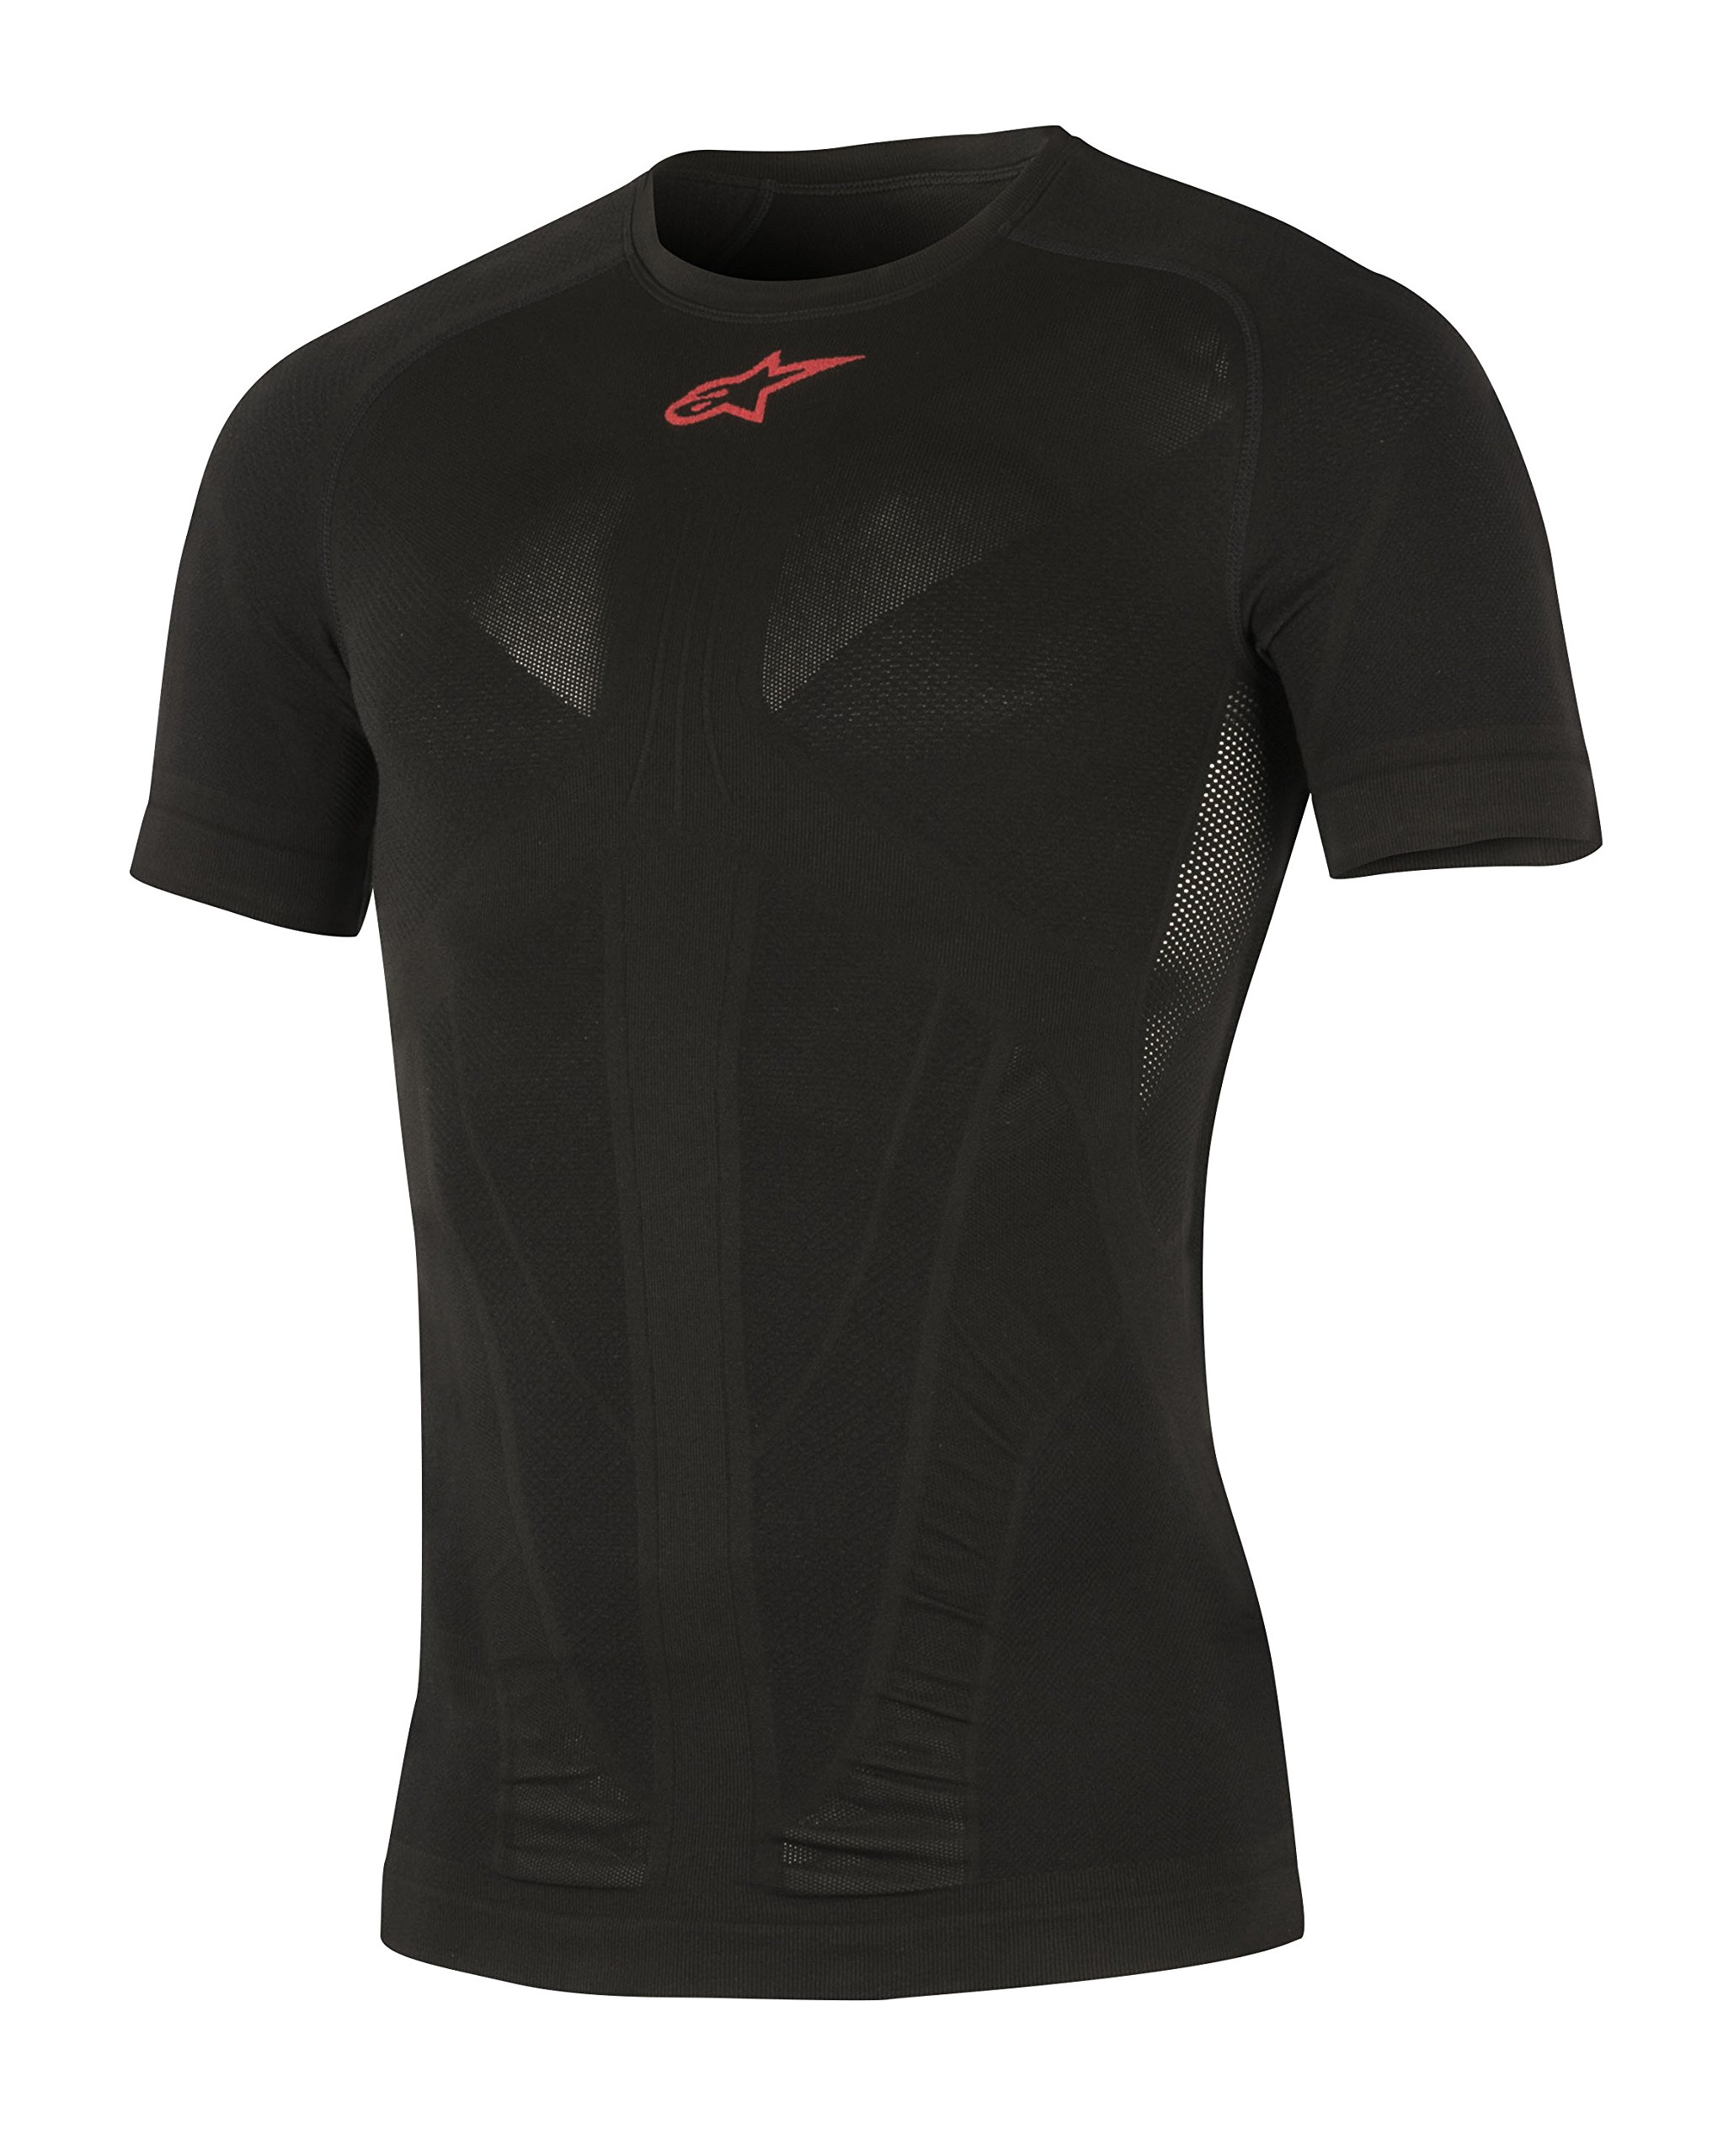 Alpinestars Tech Top Short Sleeve Summer Top, Black Red, X-Large/XX-Large